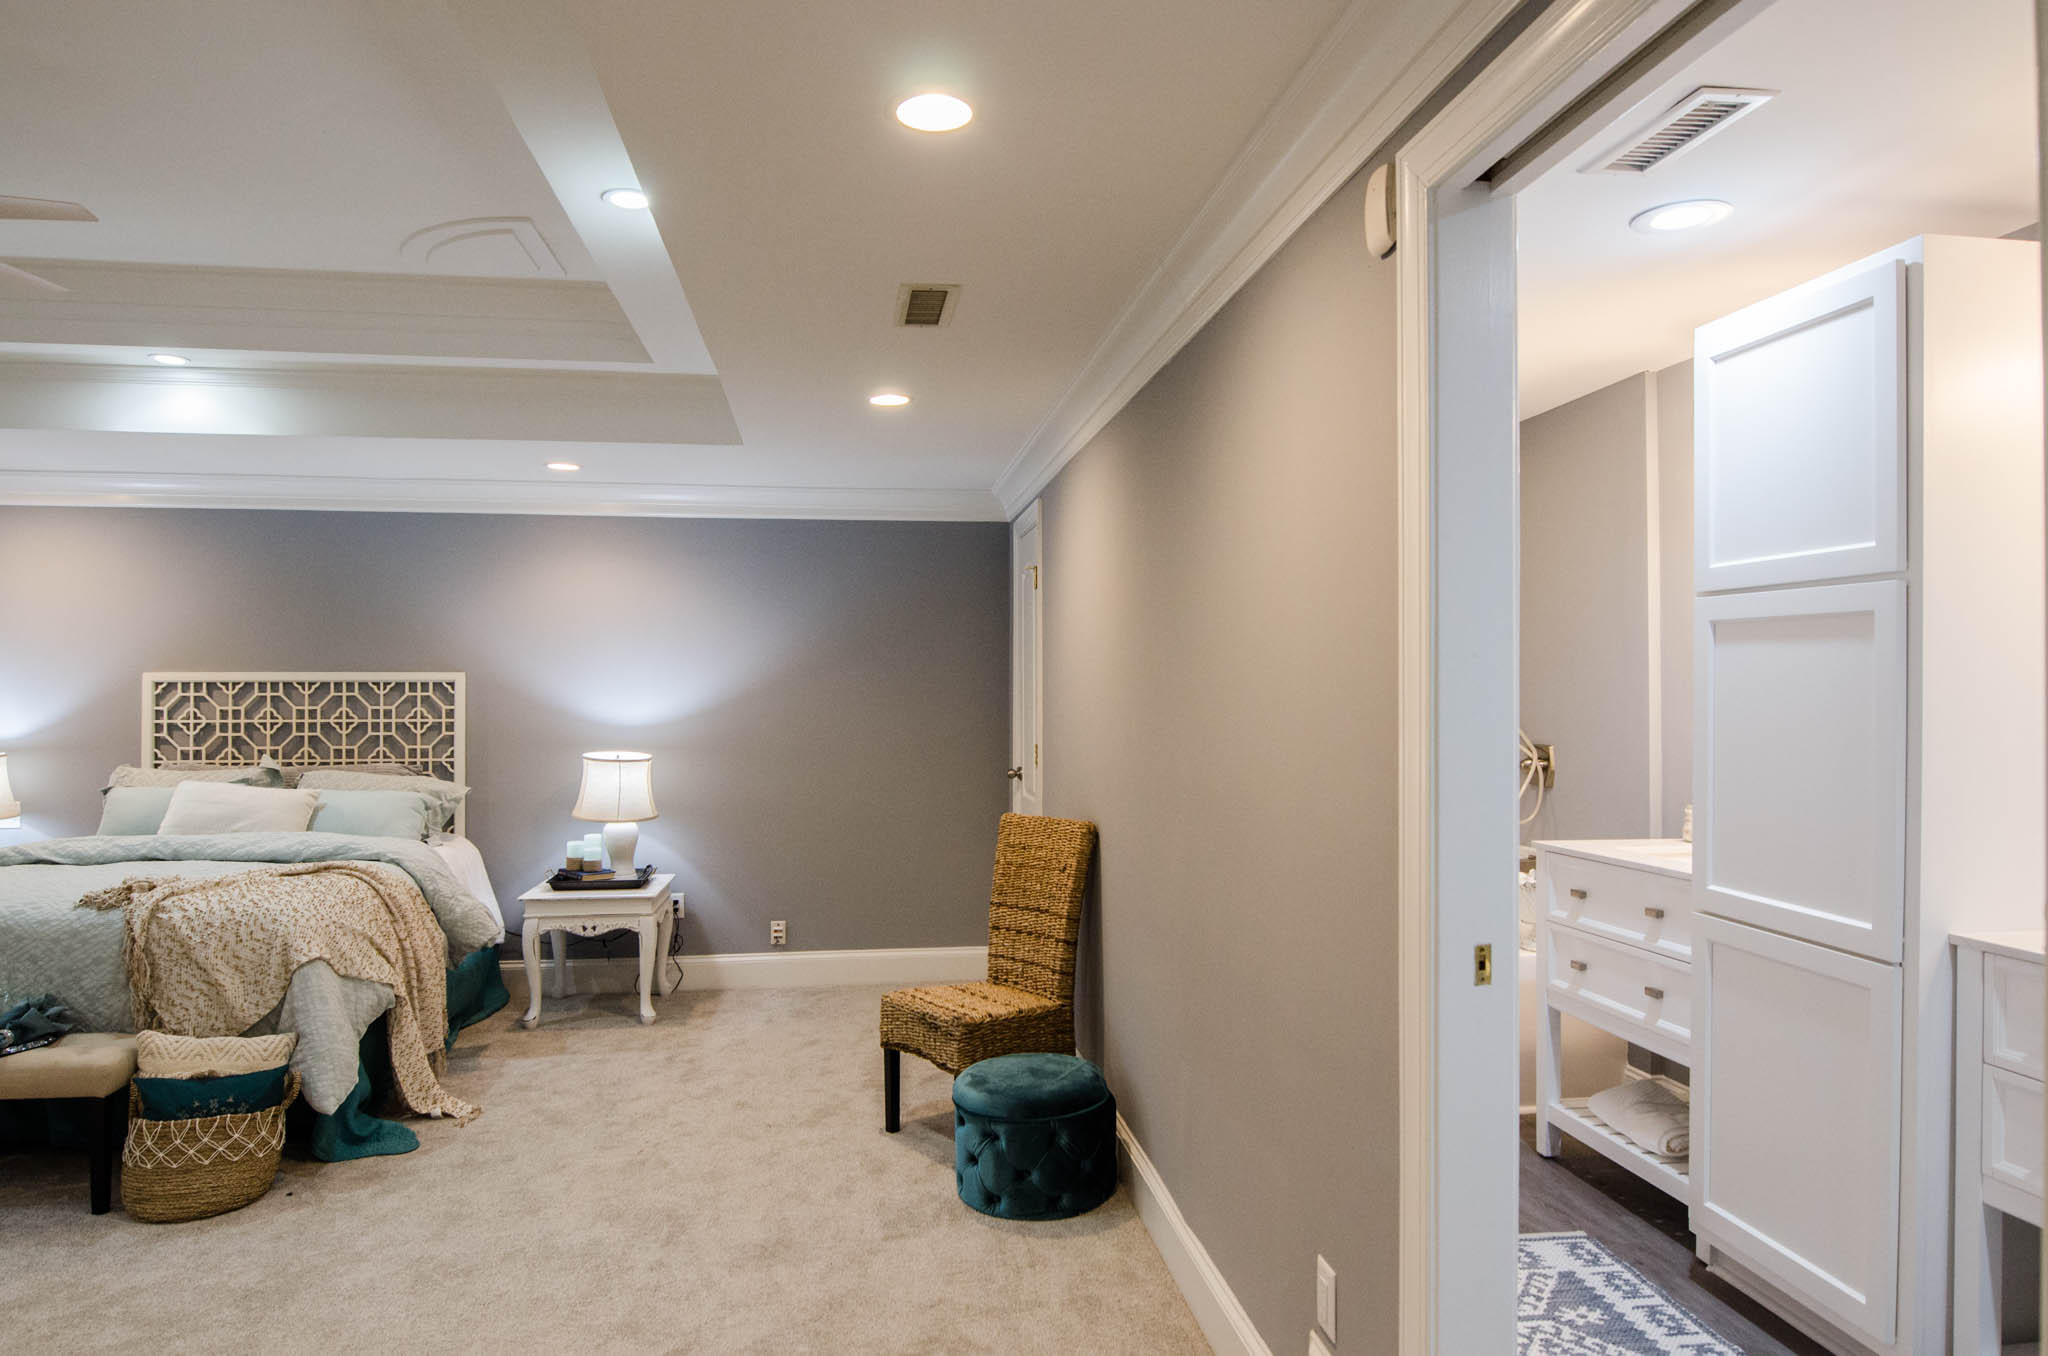 Covington Hills Homes For Sale - 5886 Ryans Bluff, North Charleston, SC - 38